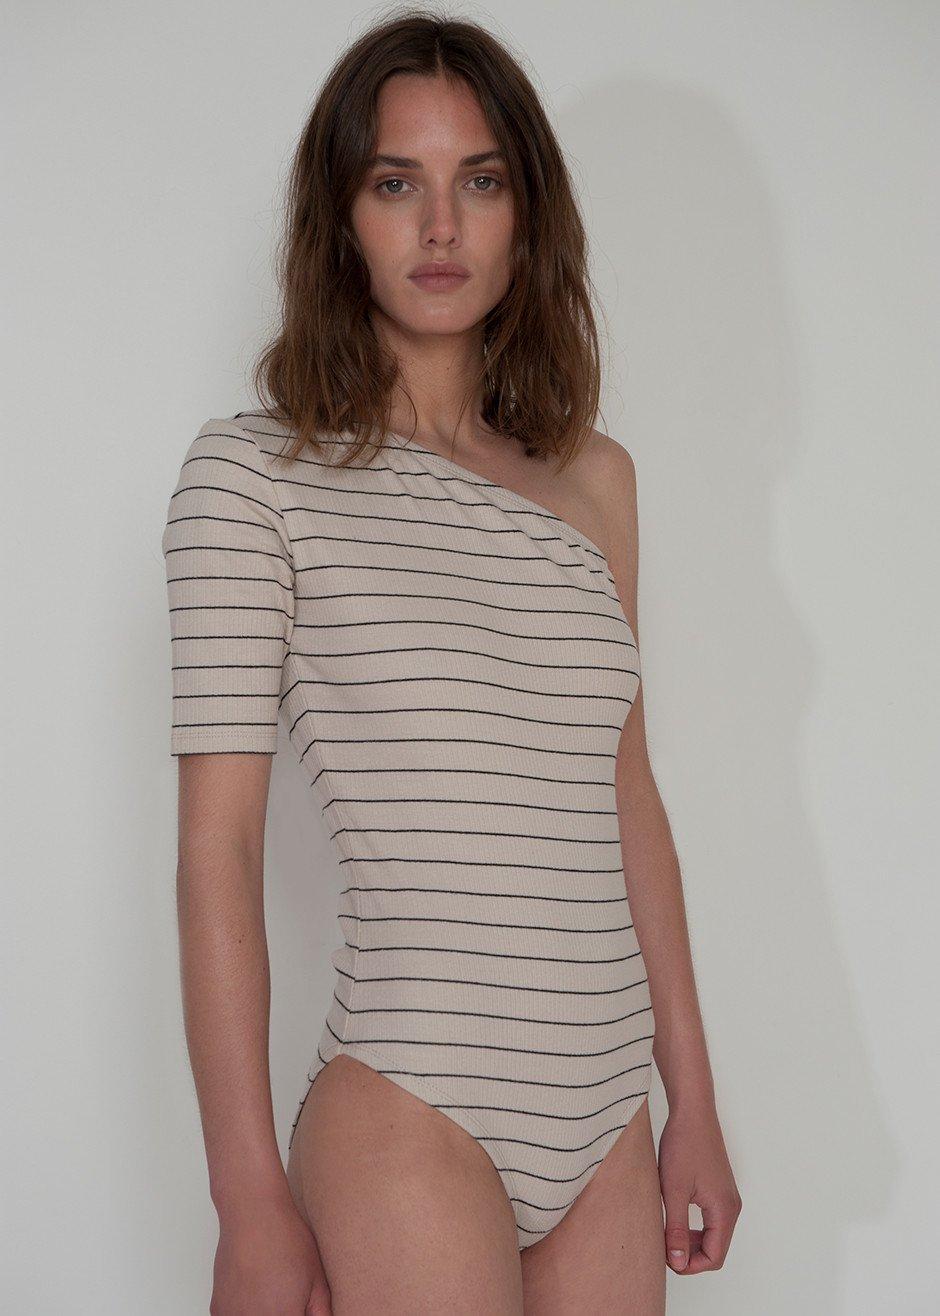 - NOVA ONE SHOULDER BODYSUIT / Just Female available at The Frankie Shop $45